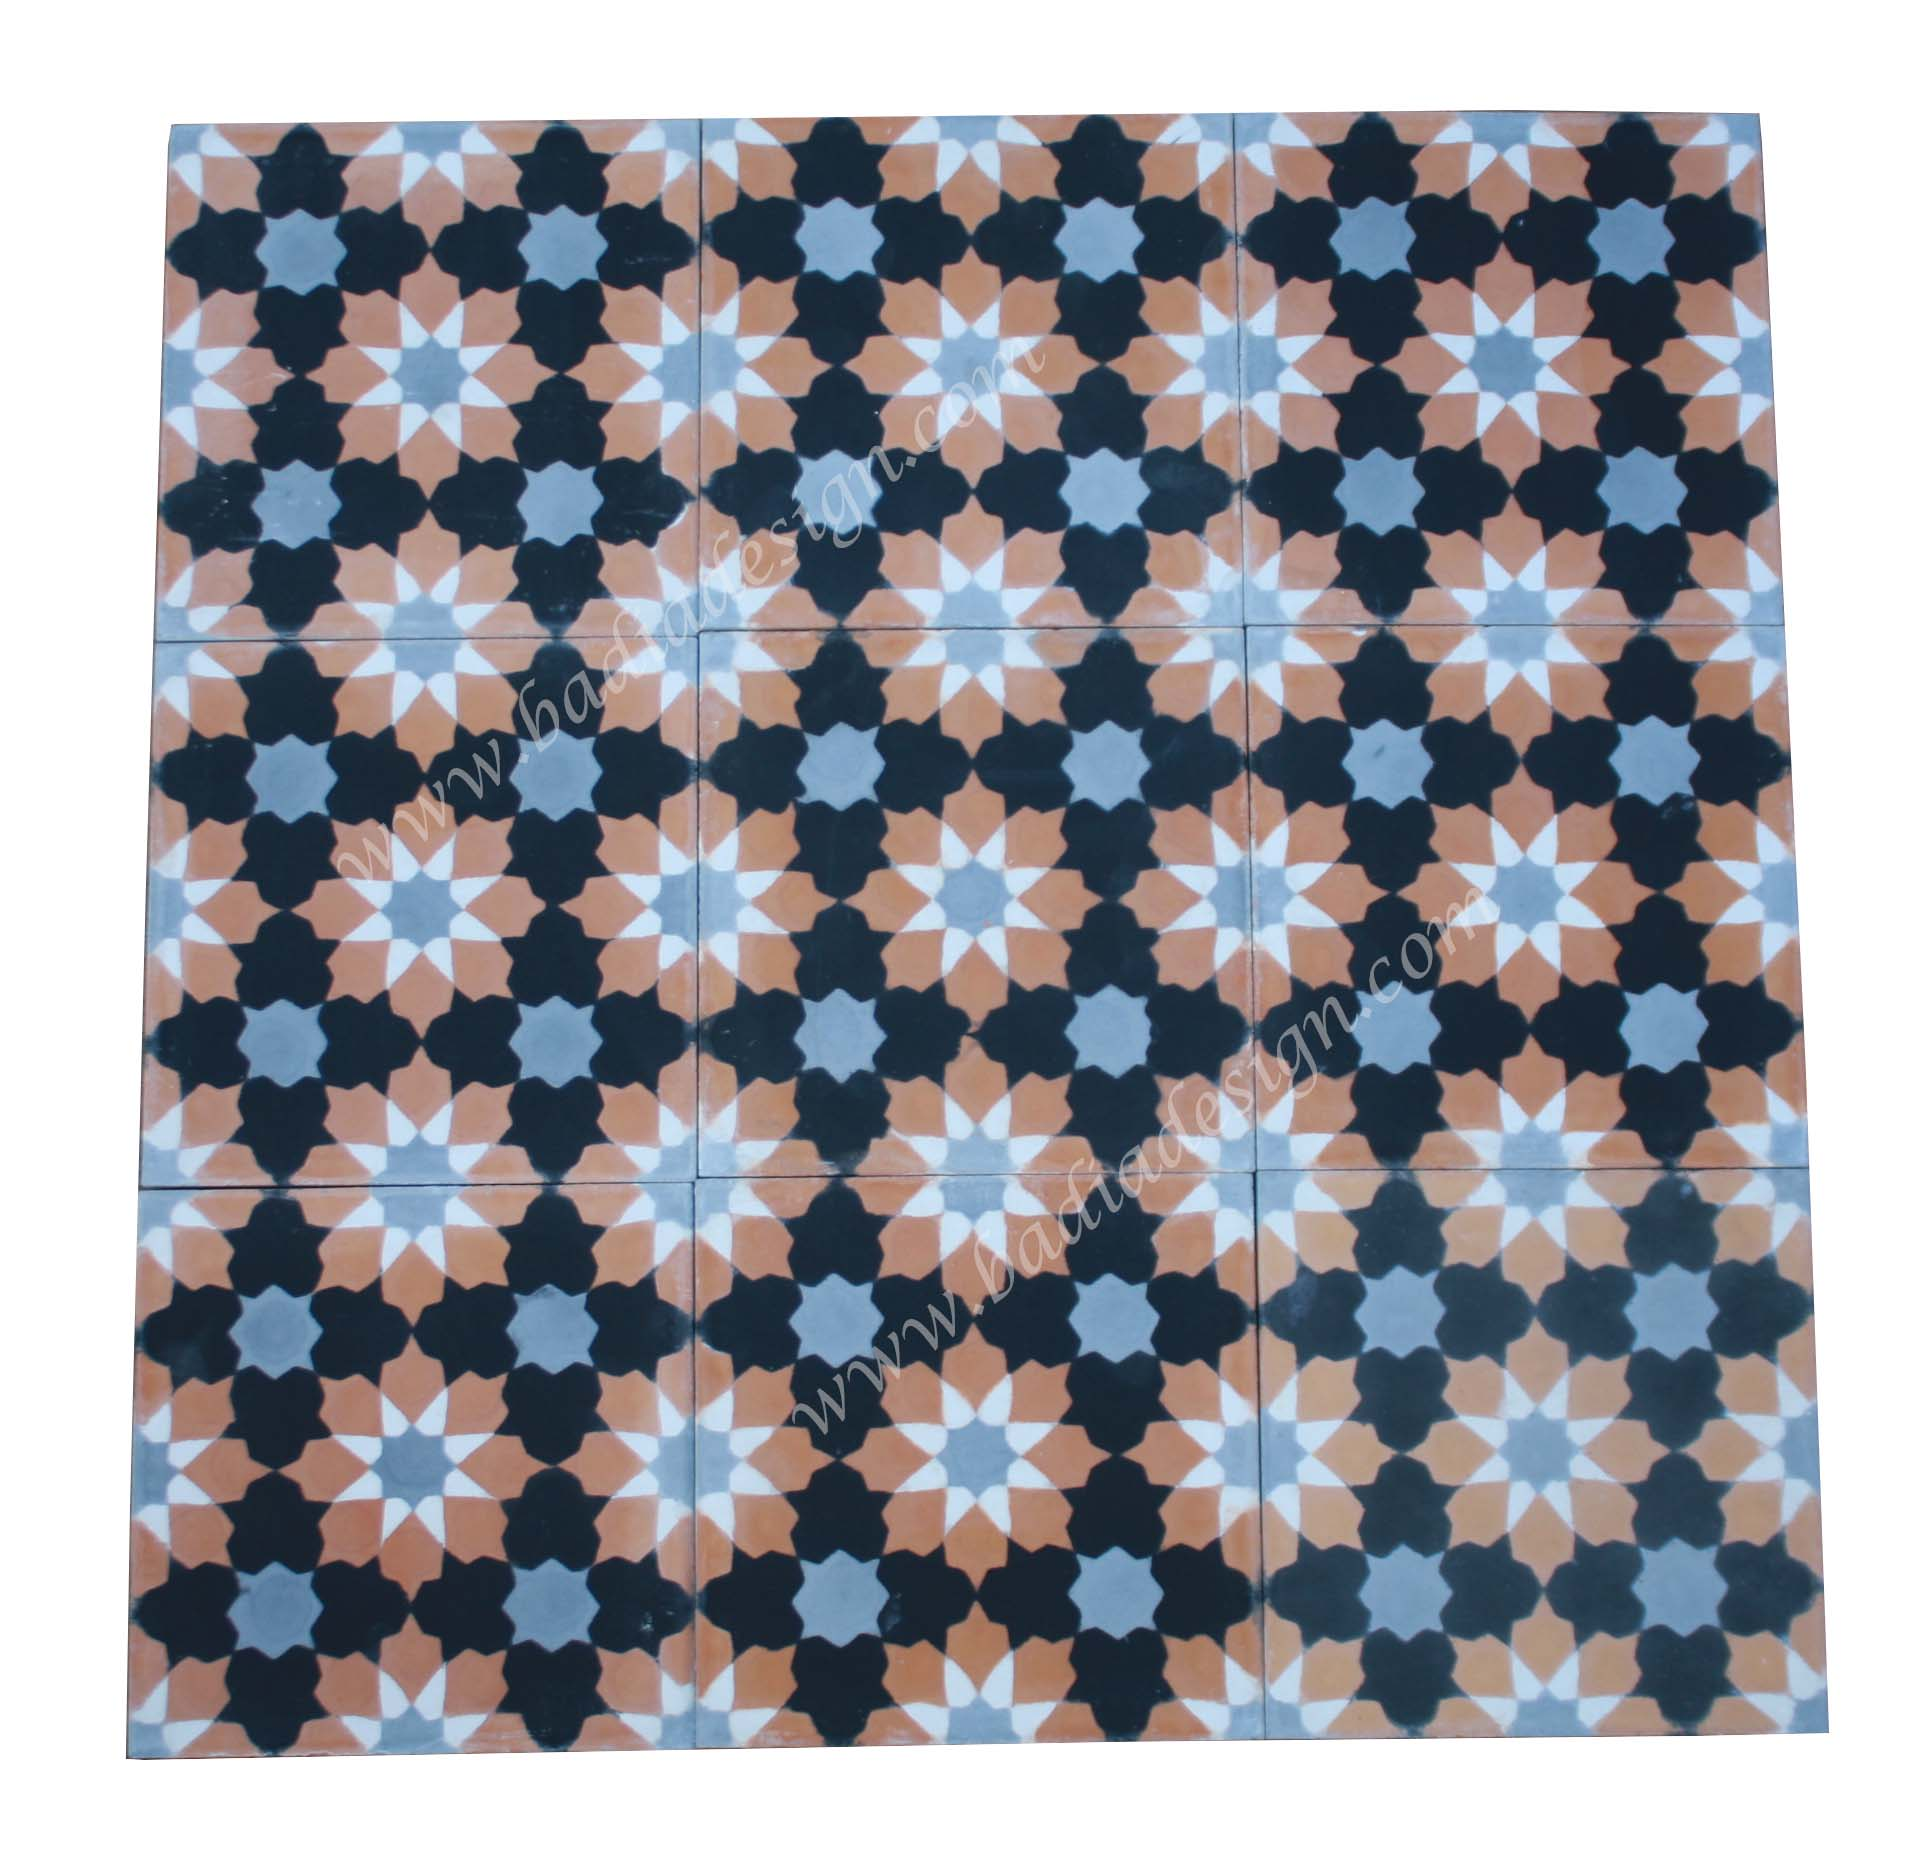 moroccan-encaustic-cement-tiles-ct090-1.jpg